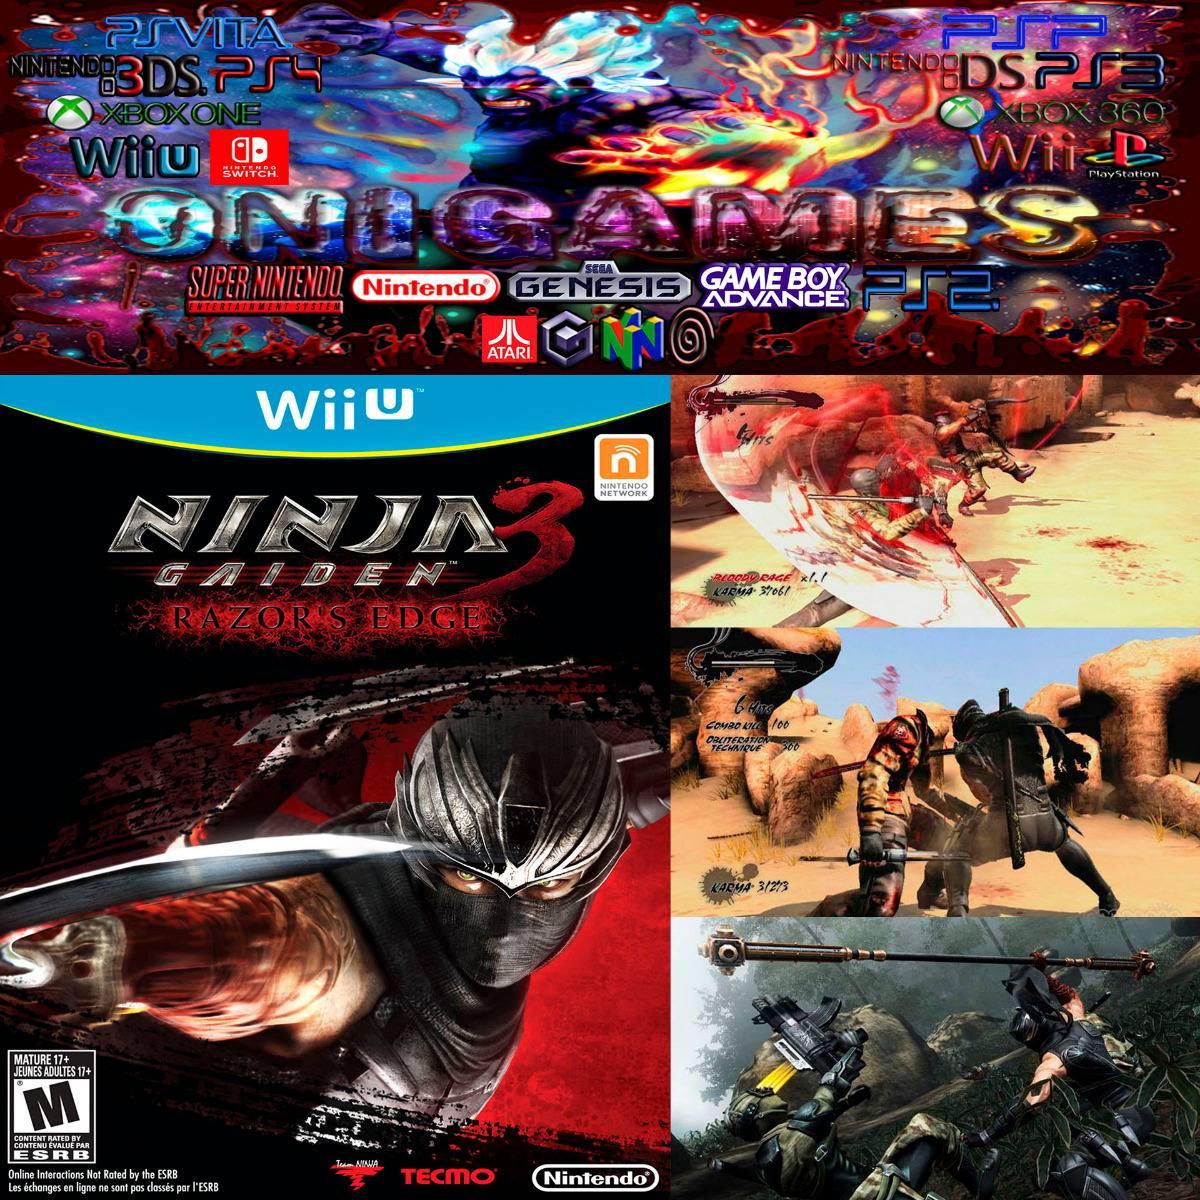 Oni Games Ninja Gaiden 3 Razor S Edge Wii U 2 500 00 En Mercado Libre